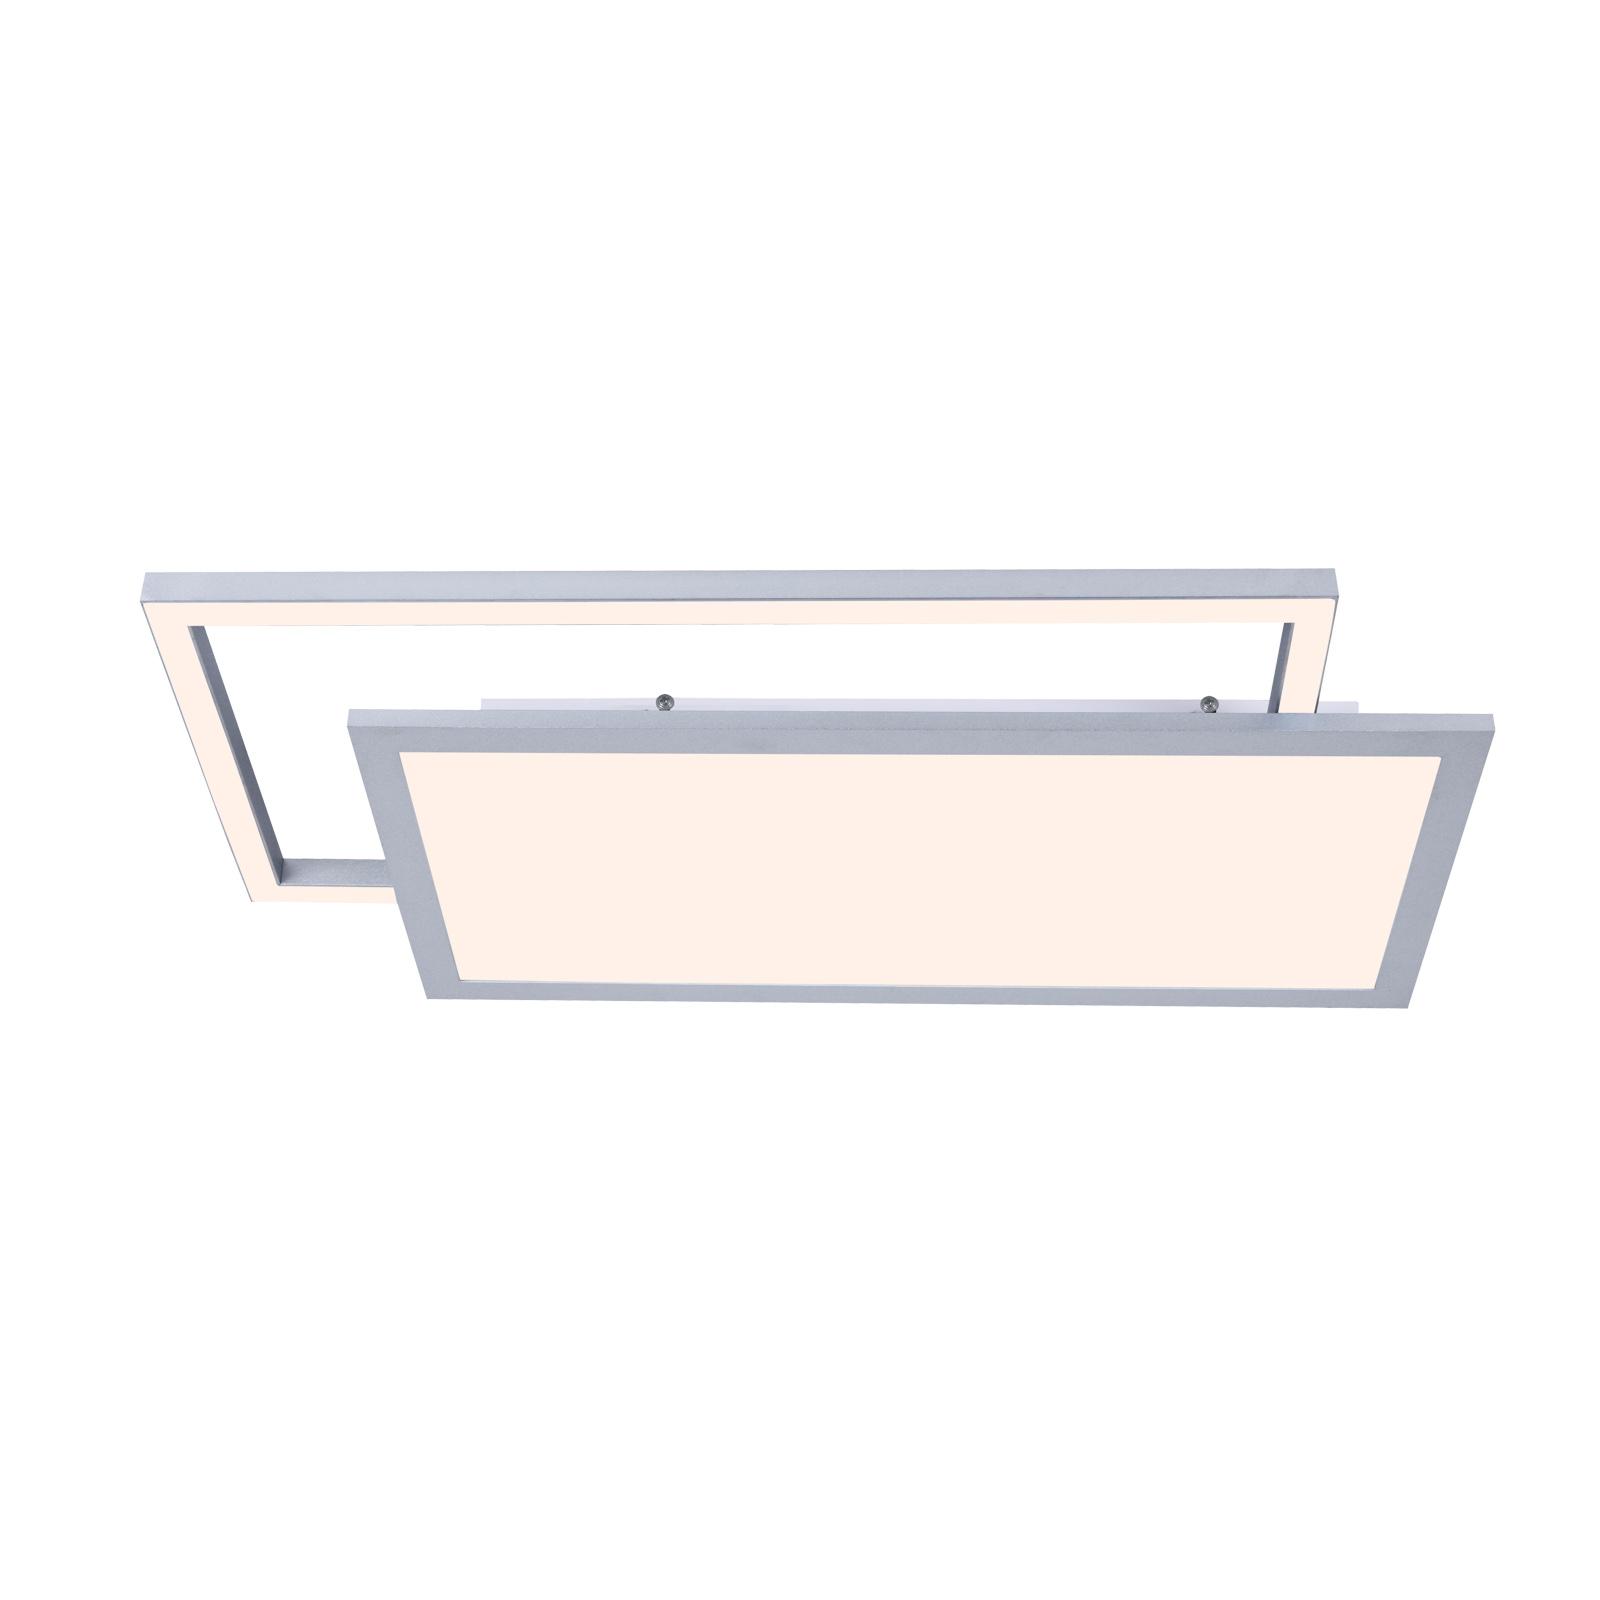 Lucande Senan lampa sufitowa LED, prostokąty